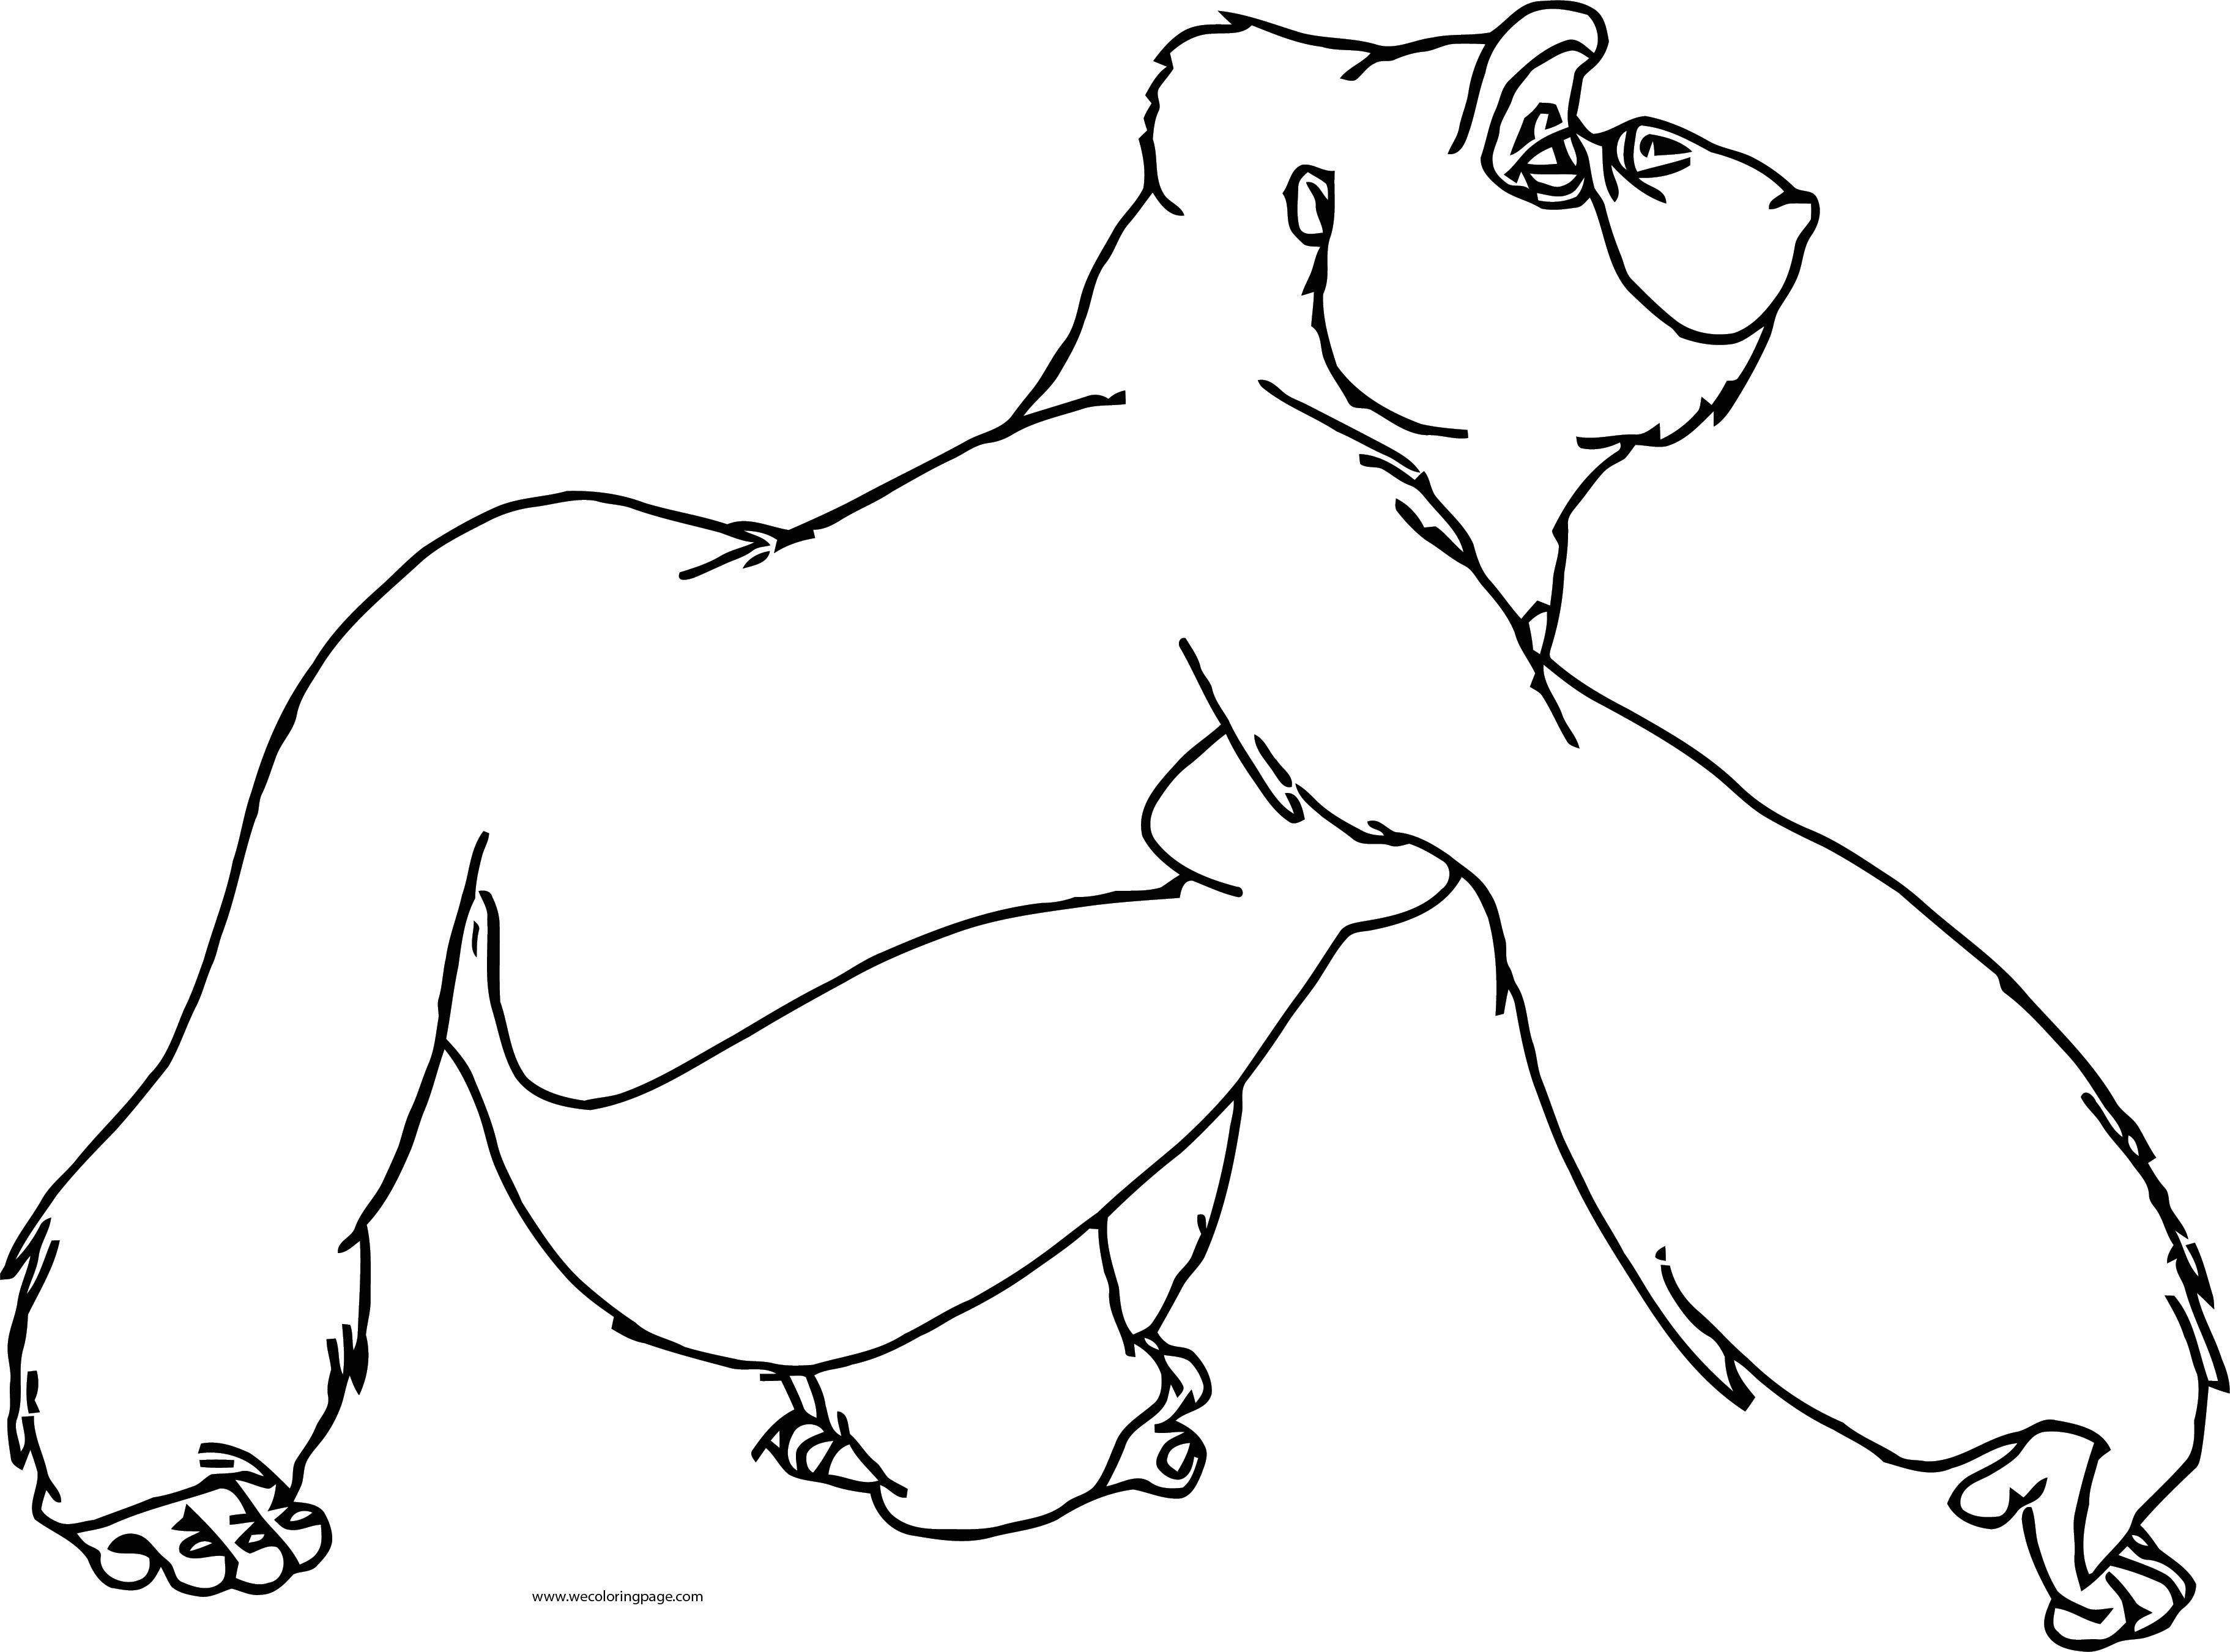 Tarzan Kala And Kerchak Coloring Pages 03